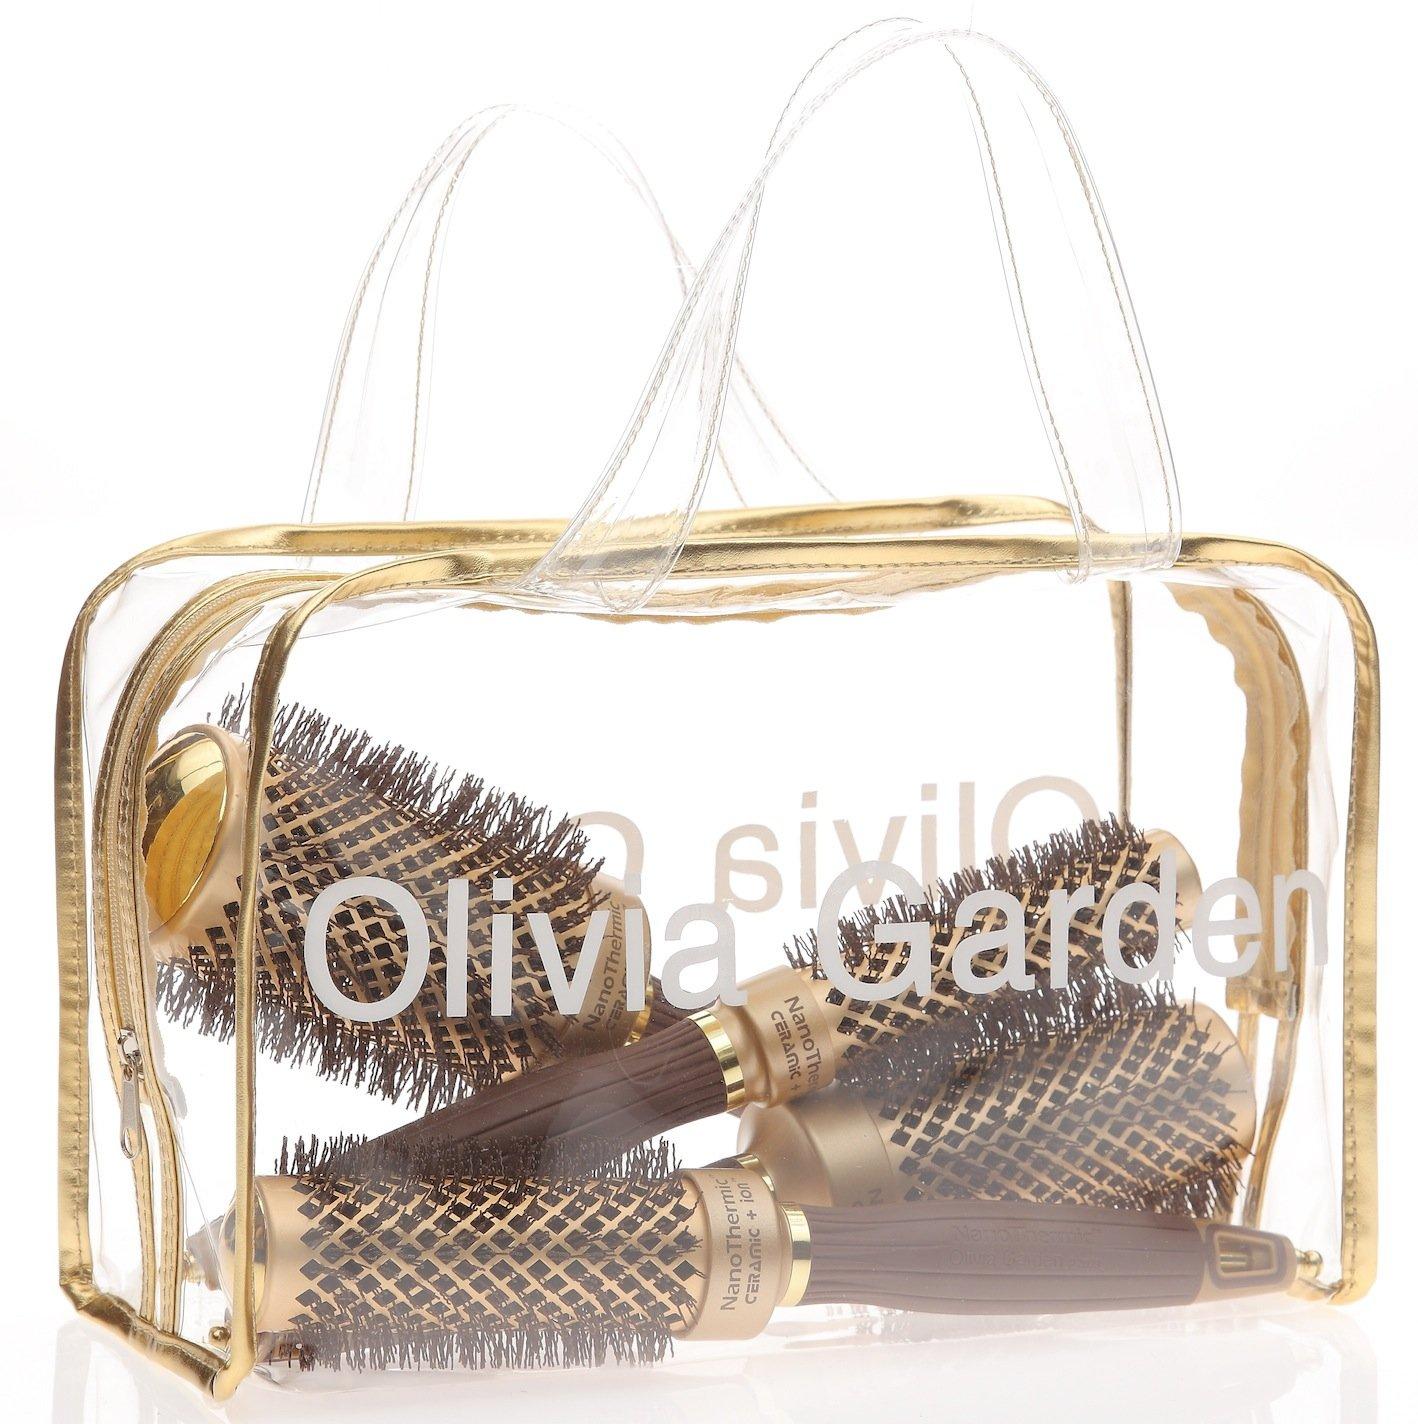 Olivia Garden NanoThermic Ceramic + Ion Round Thermal Hair Brush (3-Piece Deal)